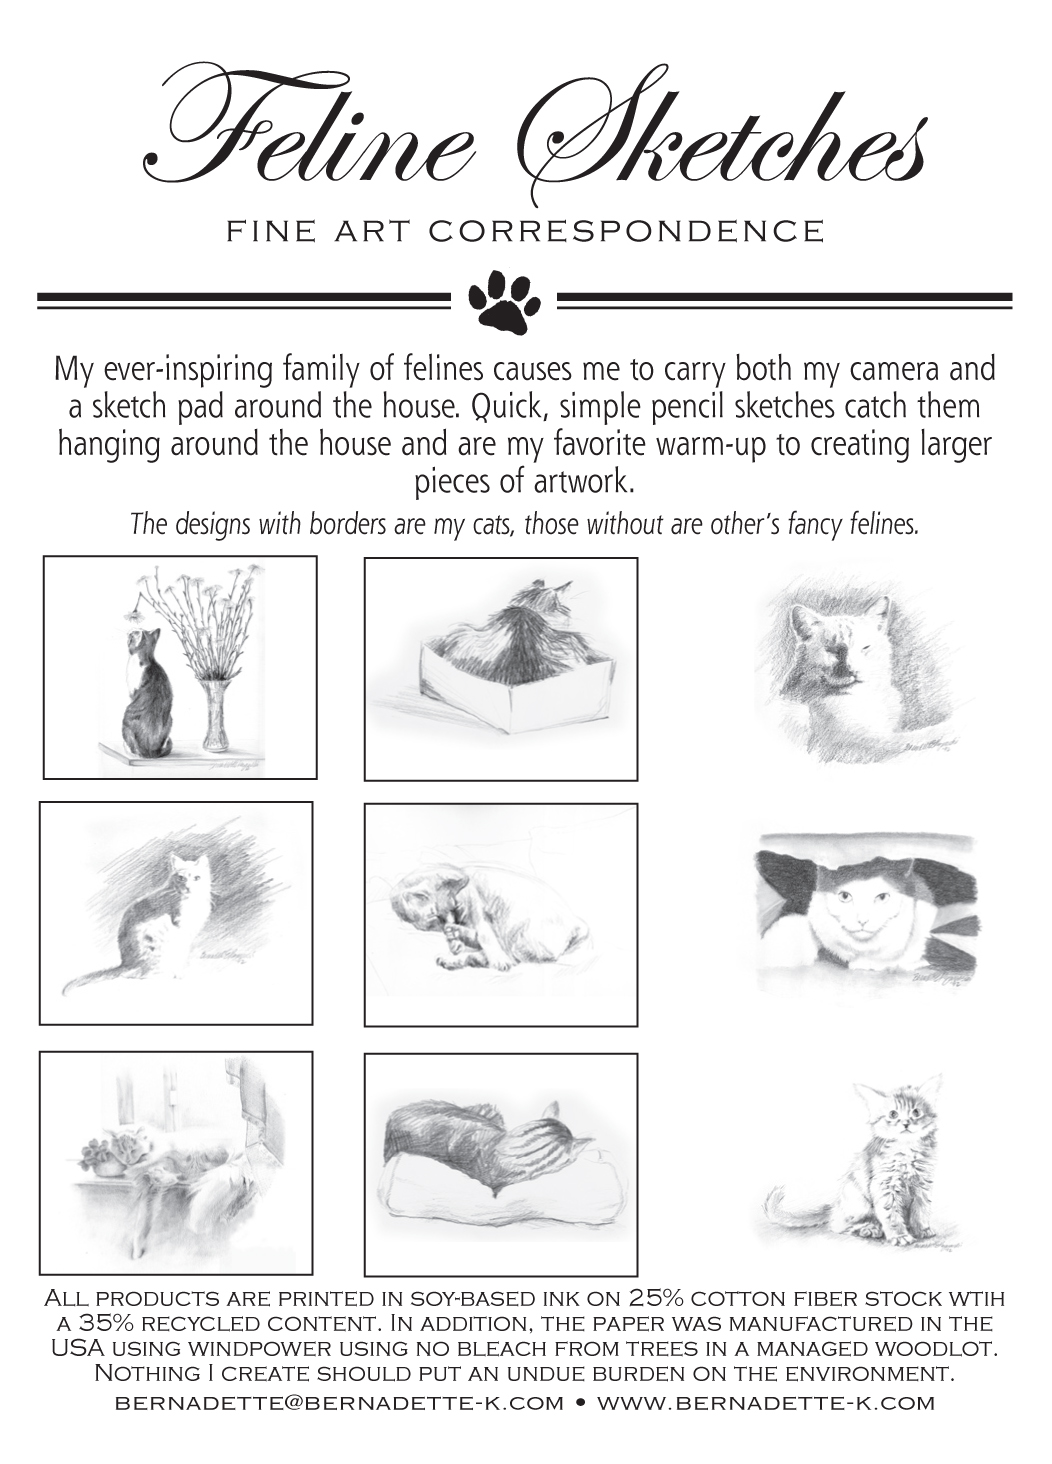 Feline Sketches Fine Art Correspondence